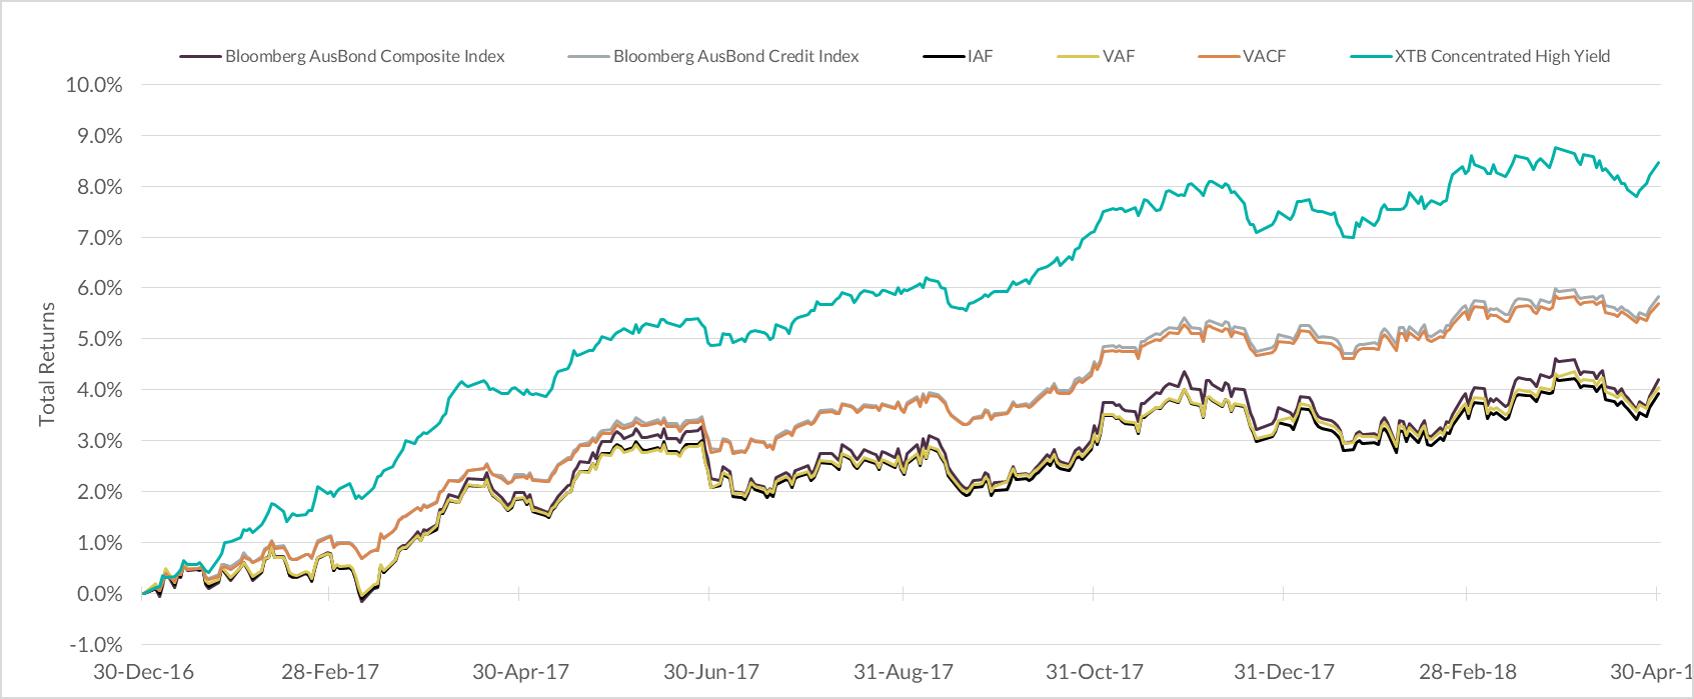 Most popular ETF indices vs Index